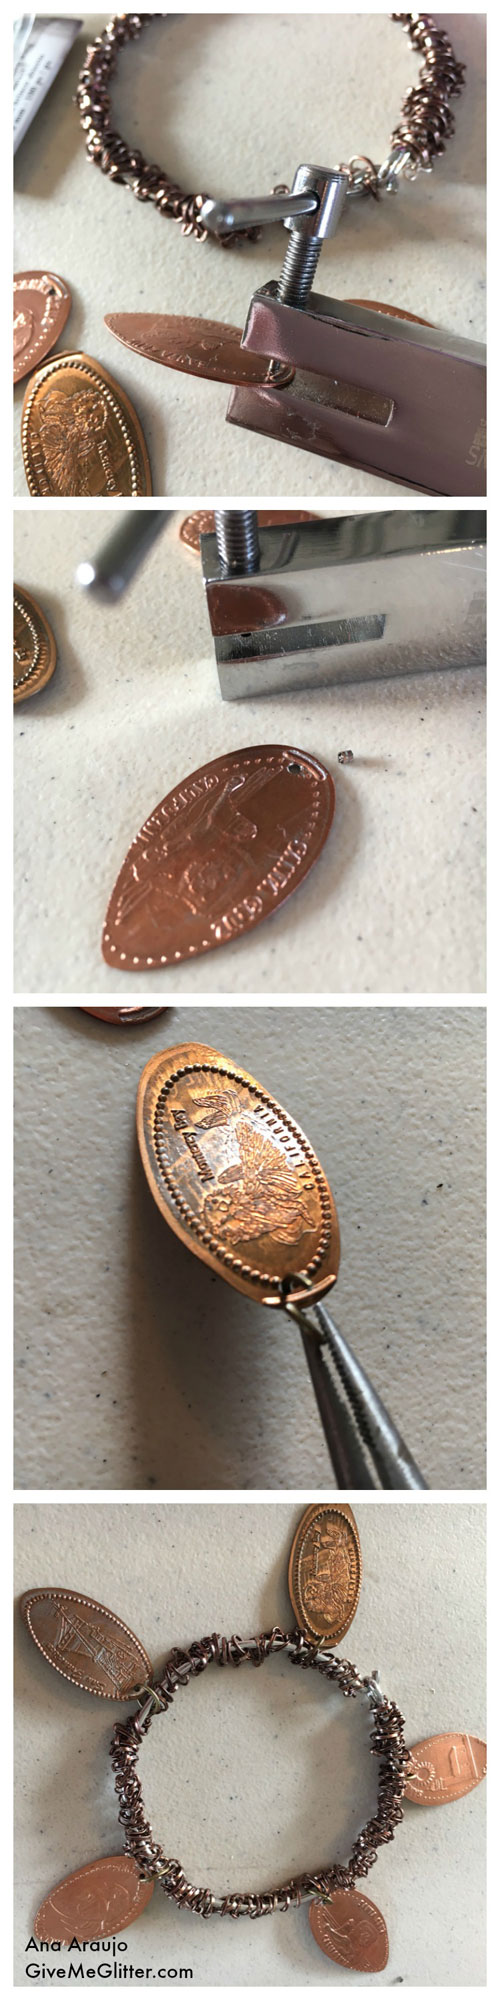 Penny Bracelet - punch hole in penny